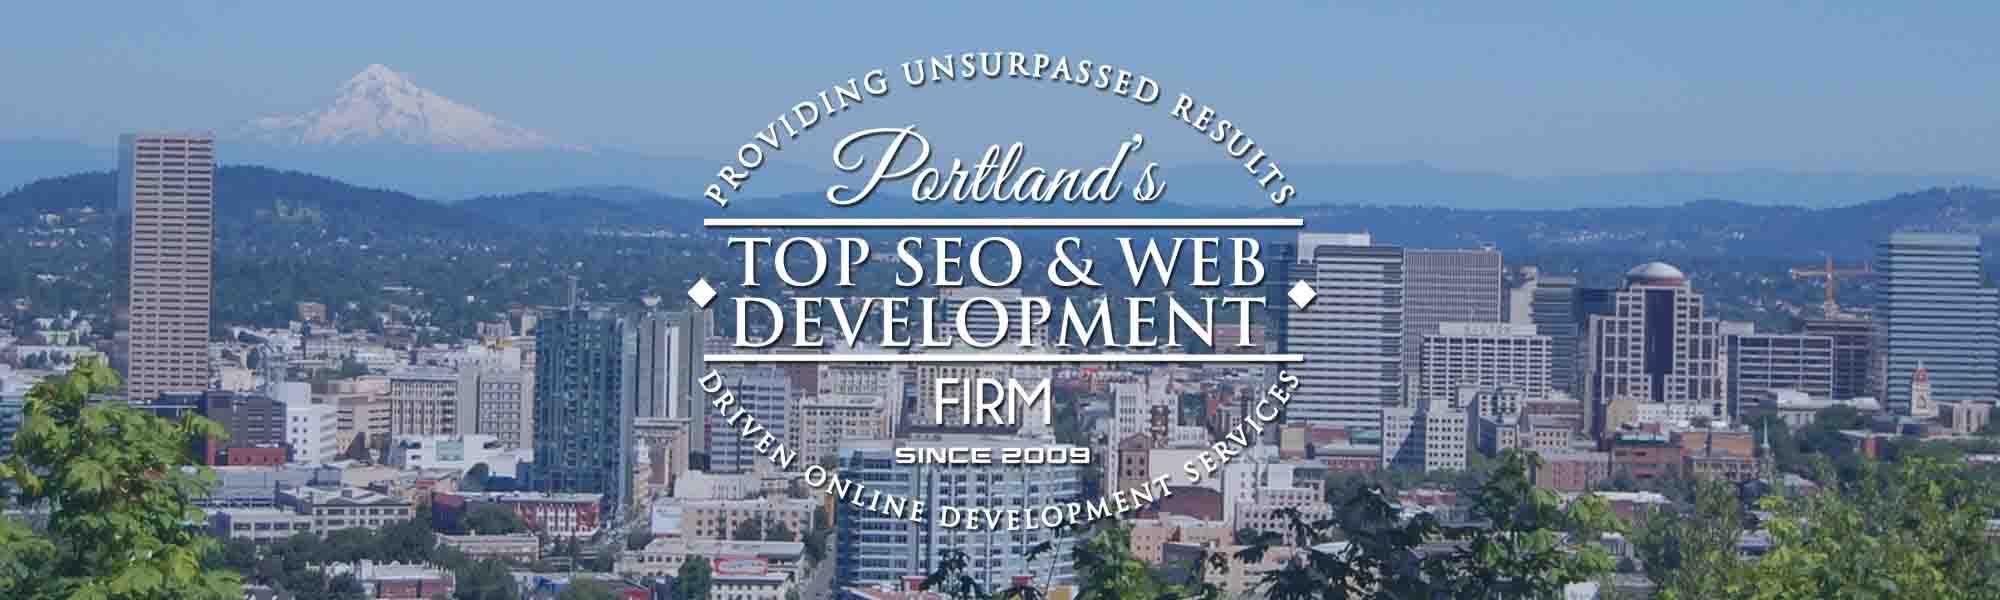 SEO-Services-Incorp-Portland-seo-consultant- seo agency